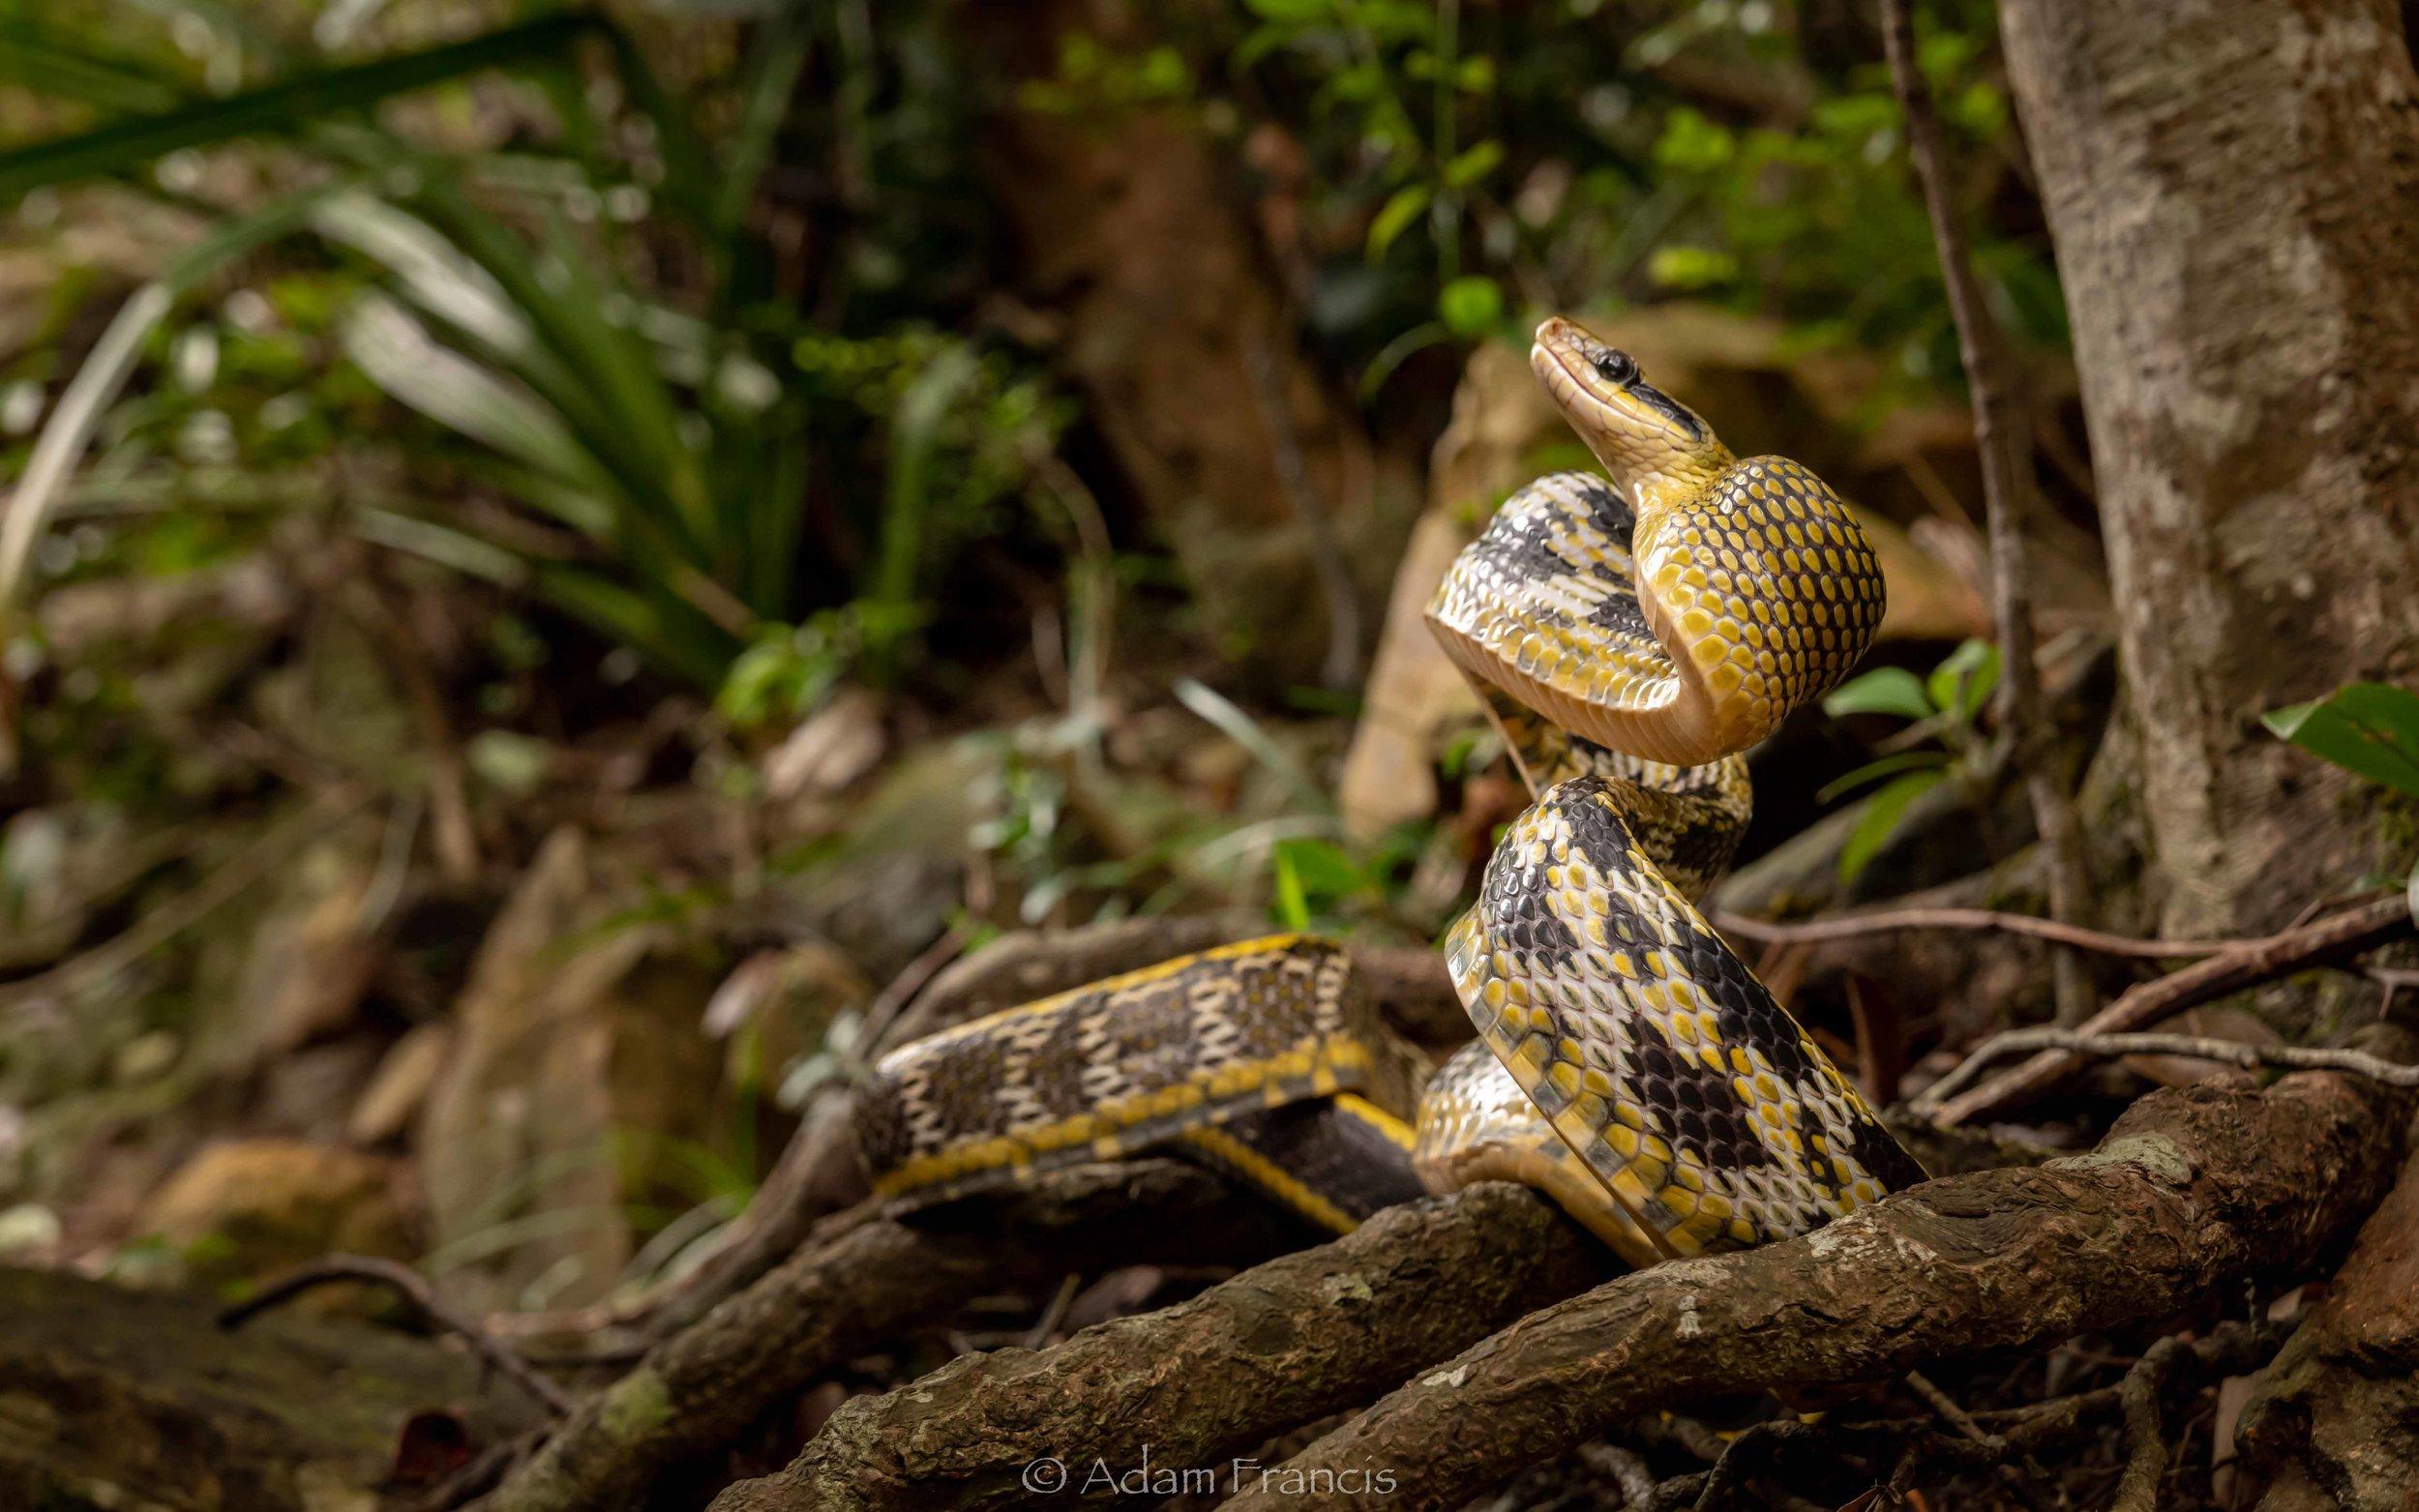 Taiwan Beauty Snake - Orthriophis taeniurus